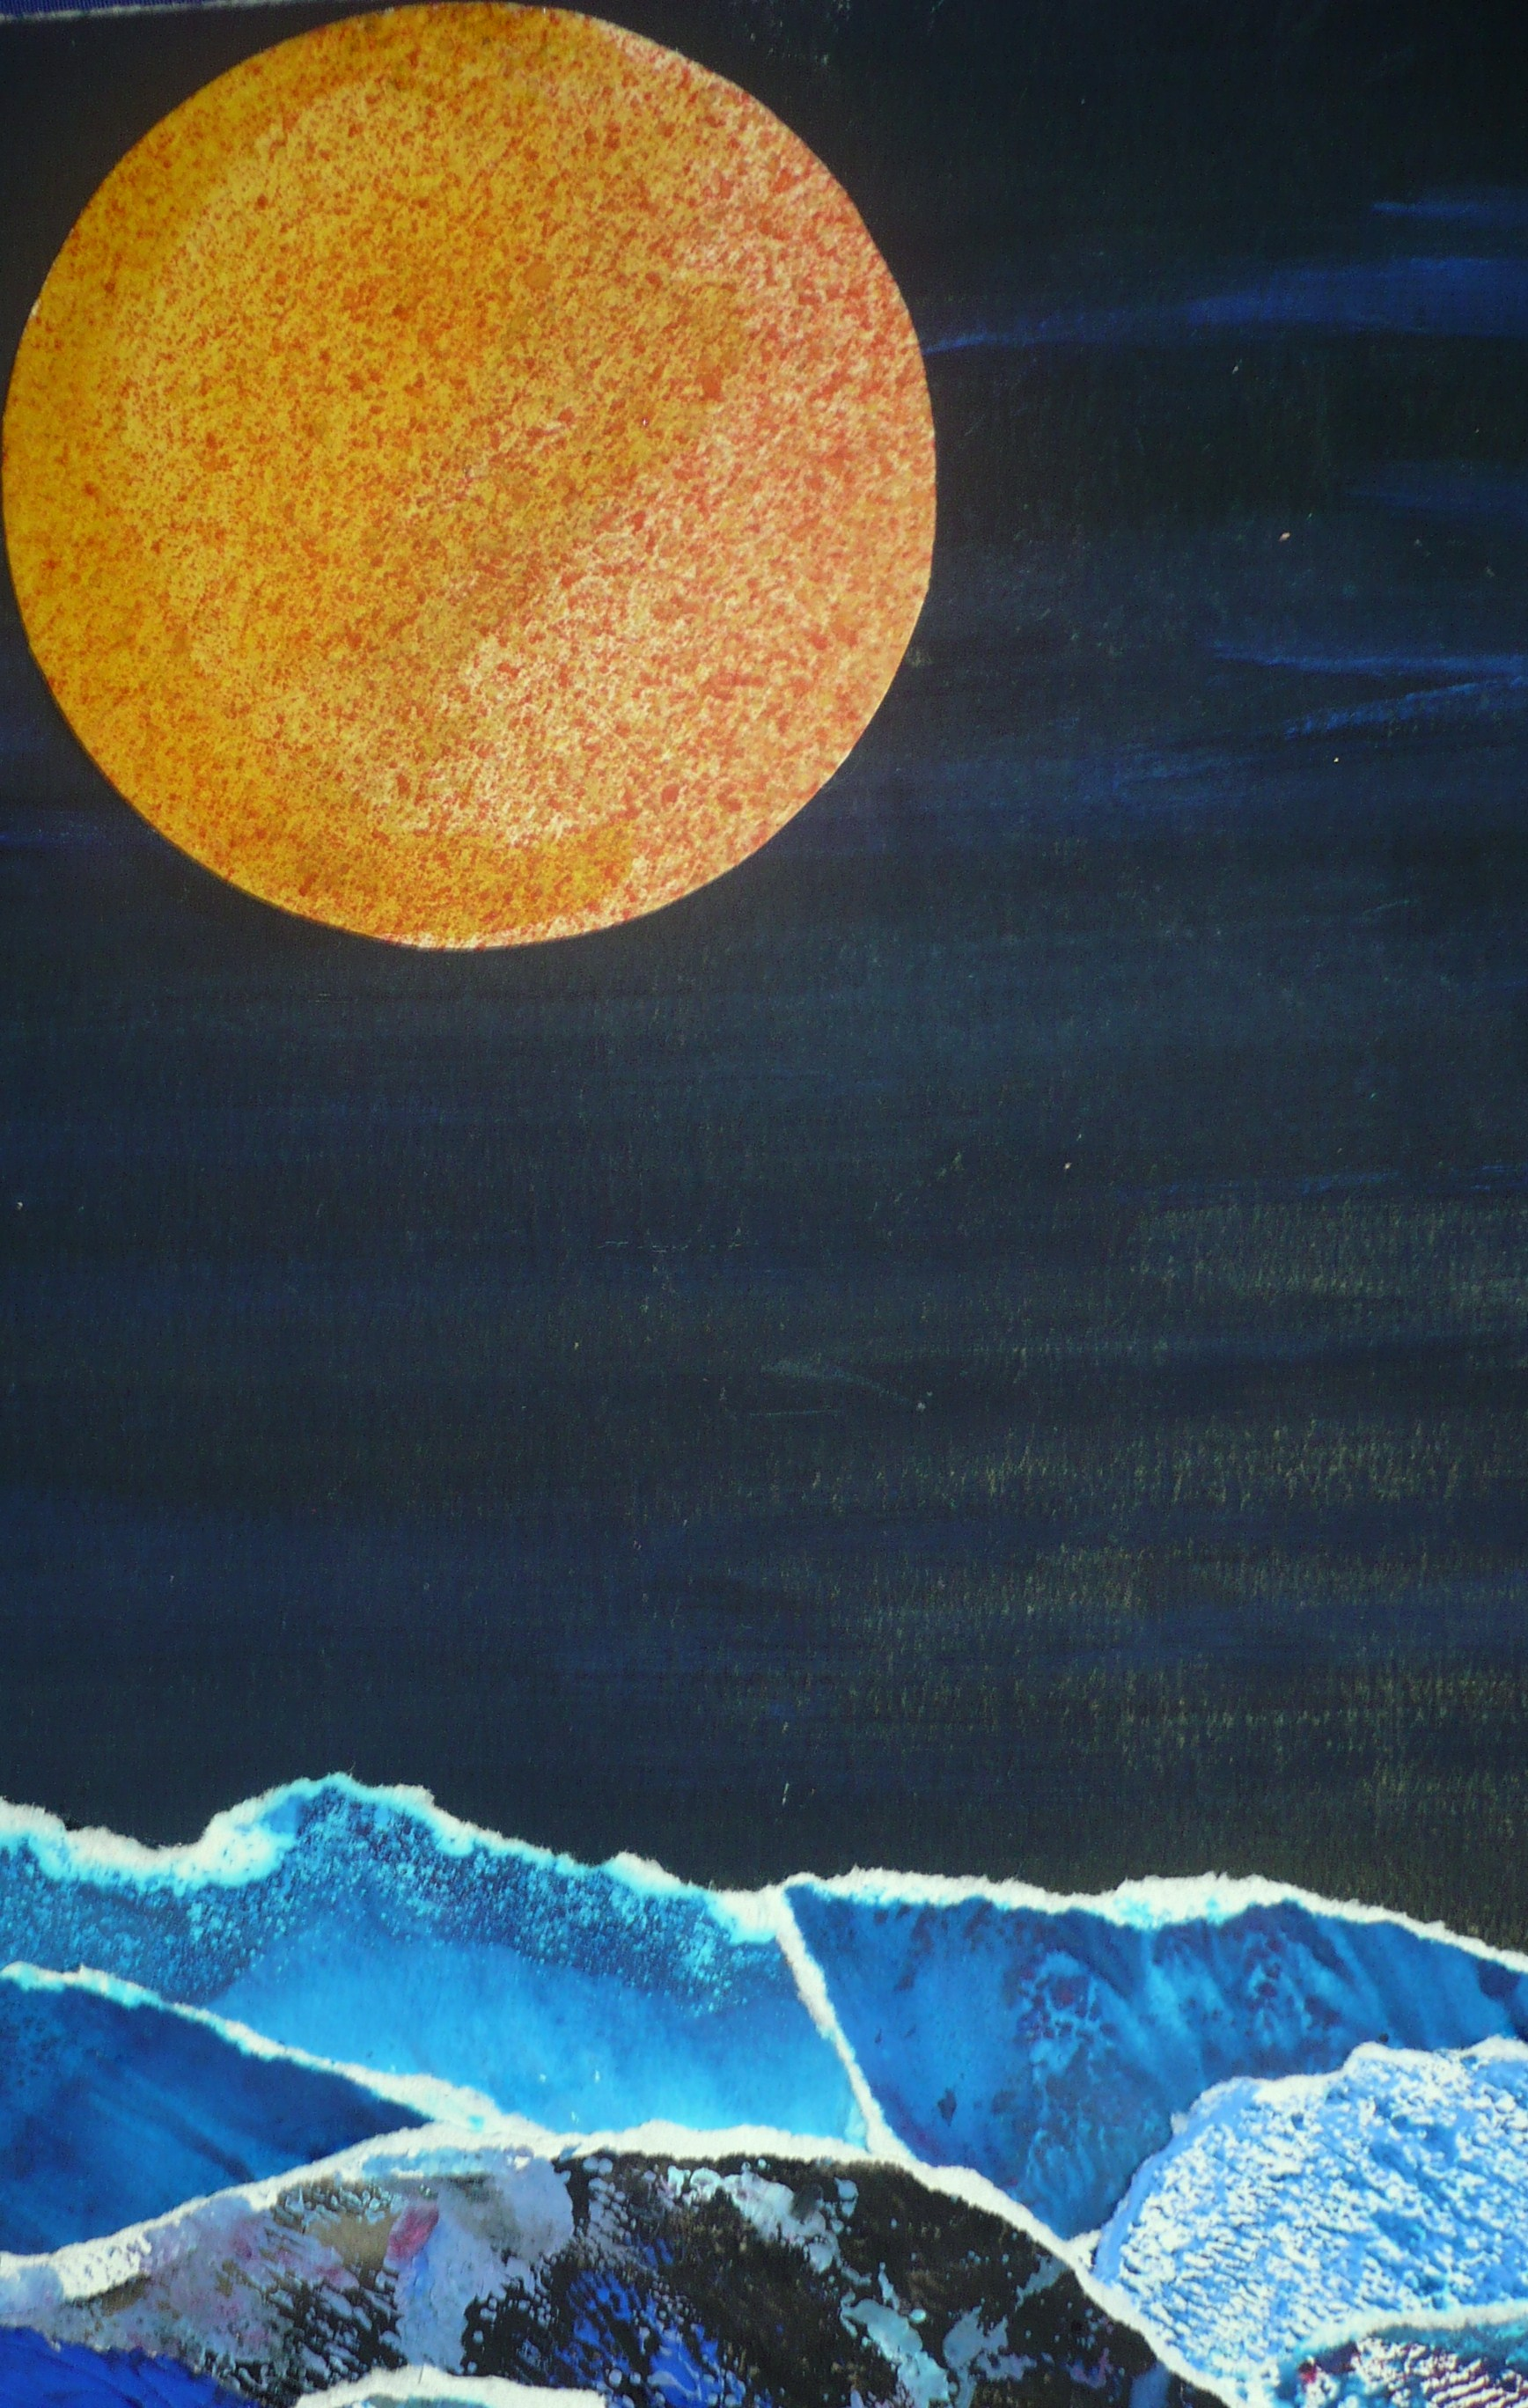 mandala-lune-003.JPG